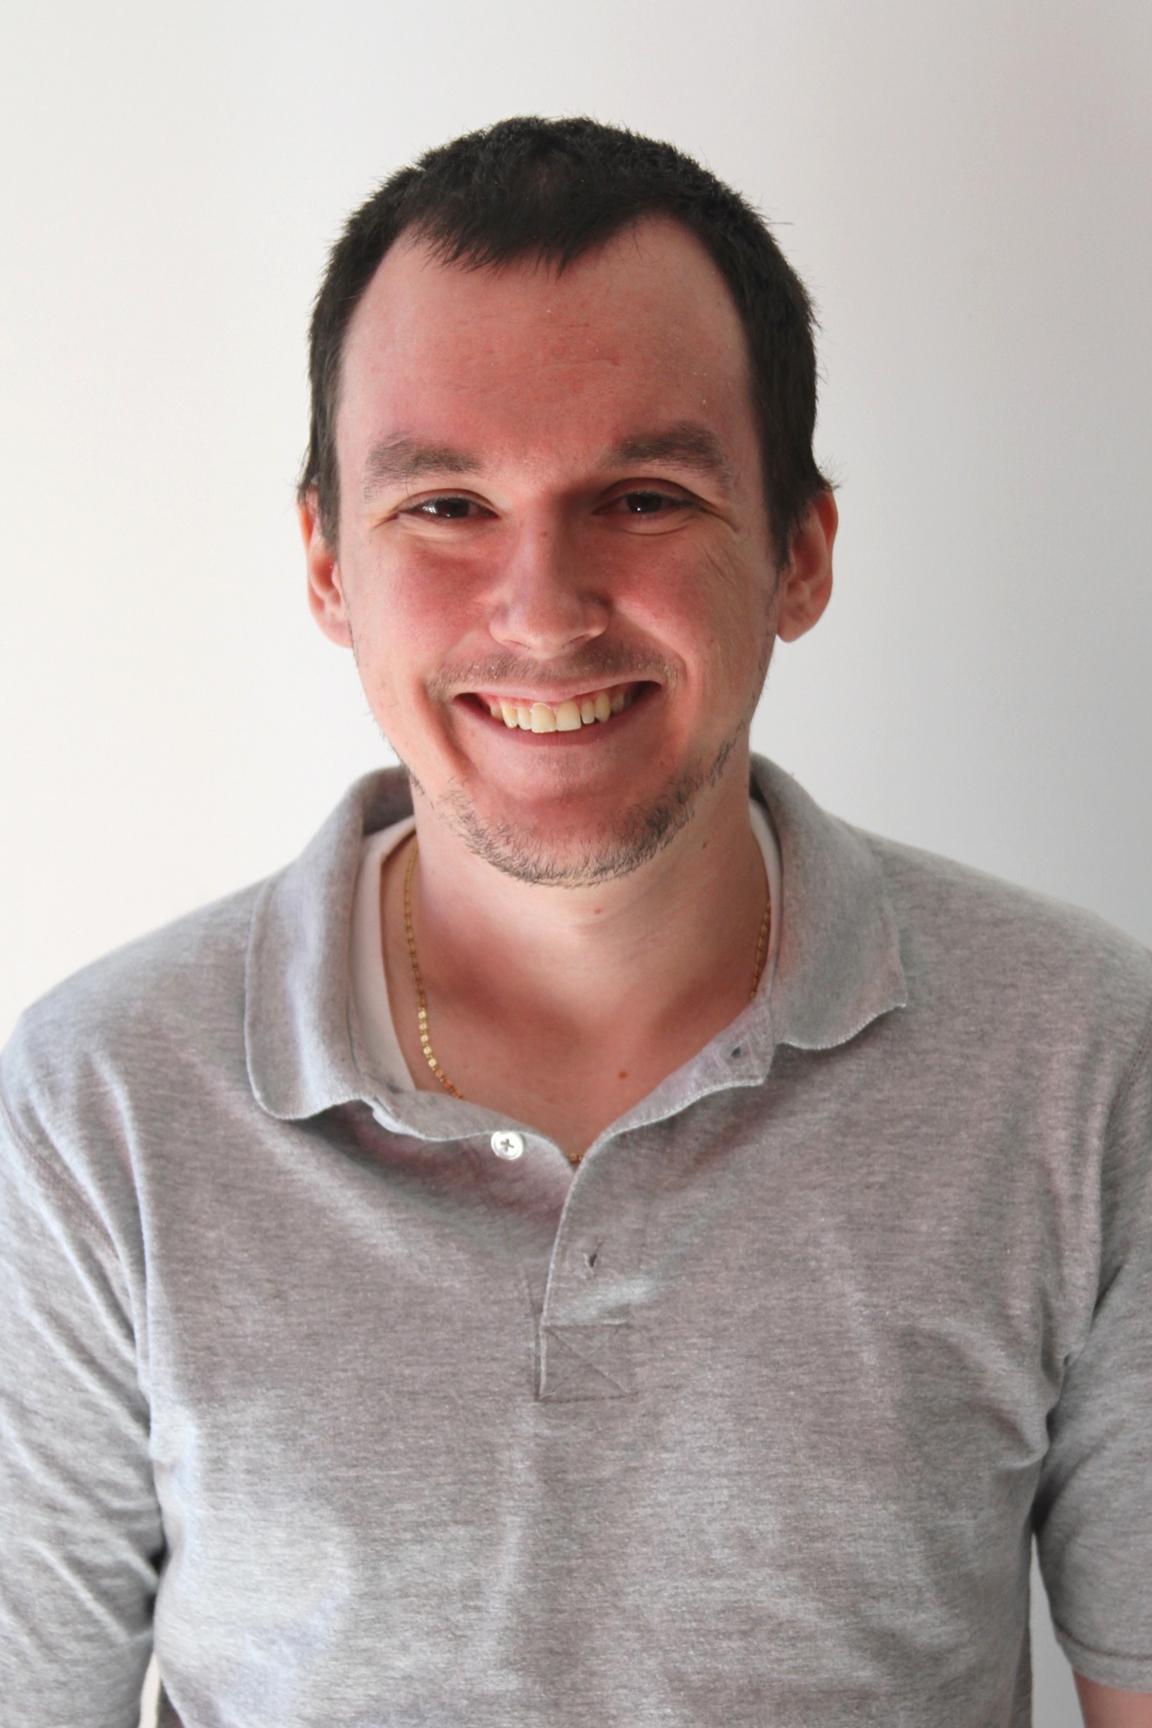 Aaron Carter Integrated Applied Mathematics Phd student